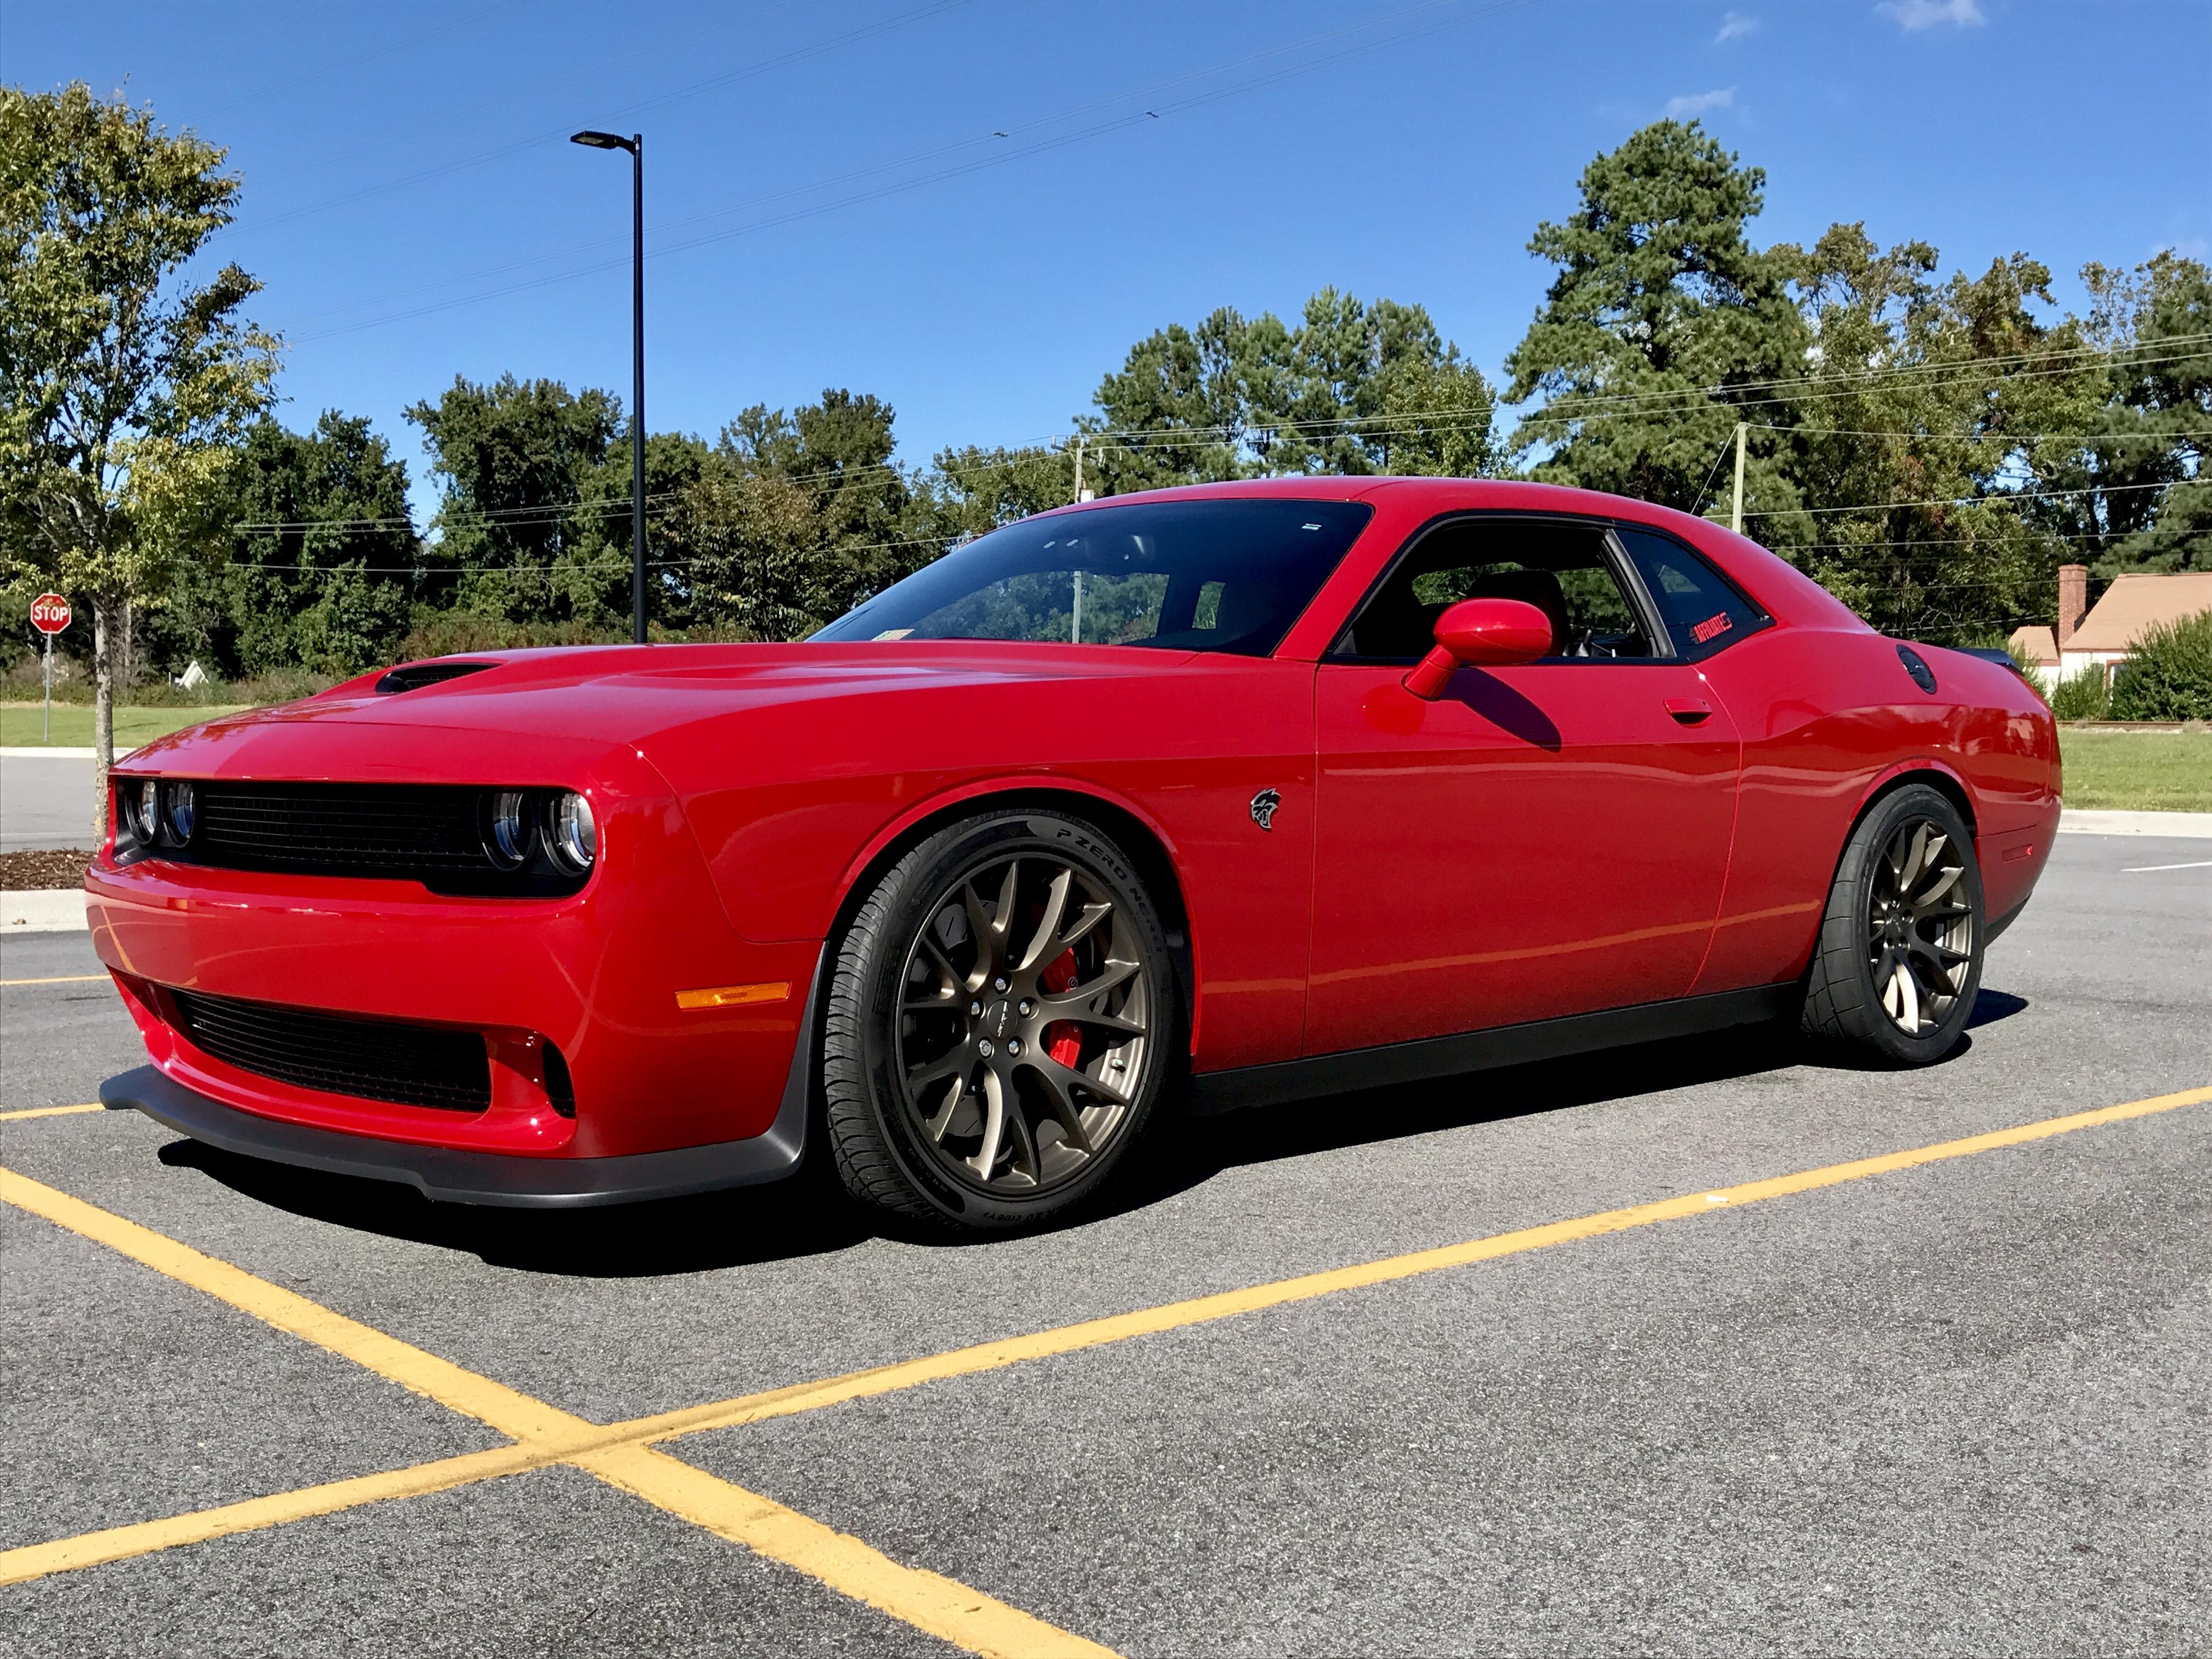 Cheap Car Tires >> Factory Reproduction Hellcat Replicas | Page 4 | SRT ...